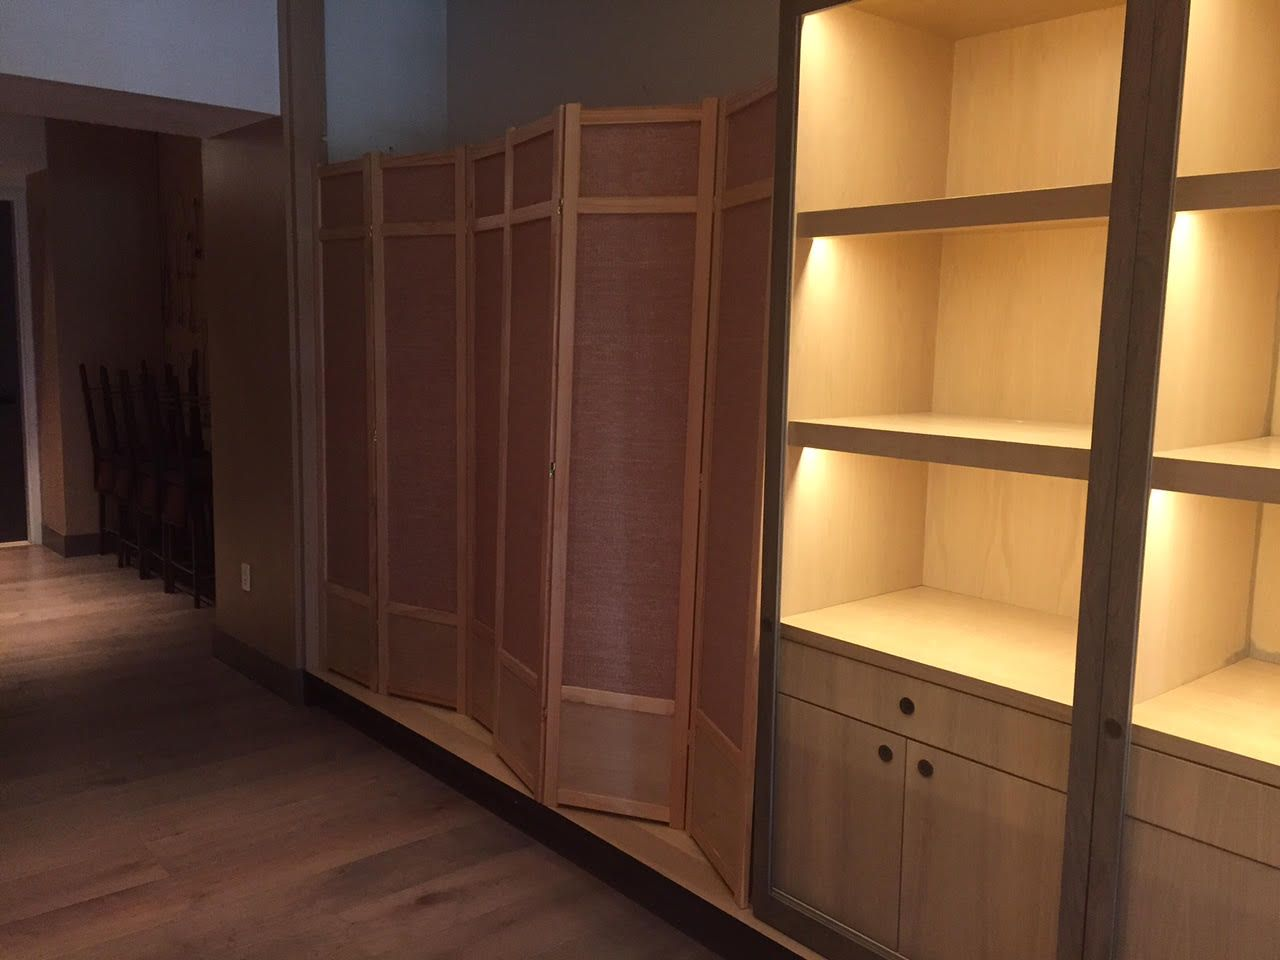 7 ft Tall Jute Shoji Room Divider Screen more panels finishes